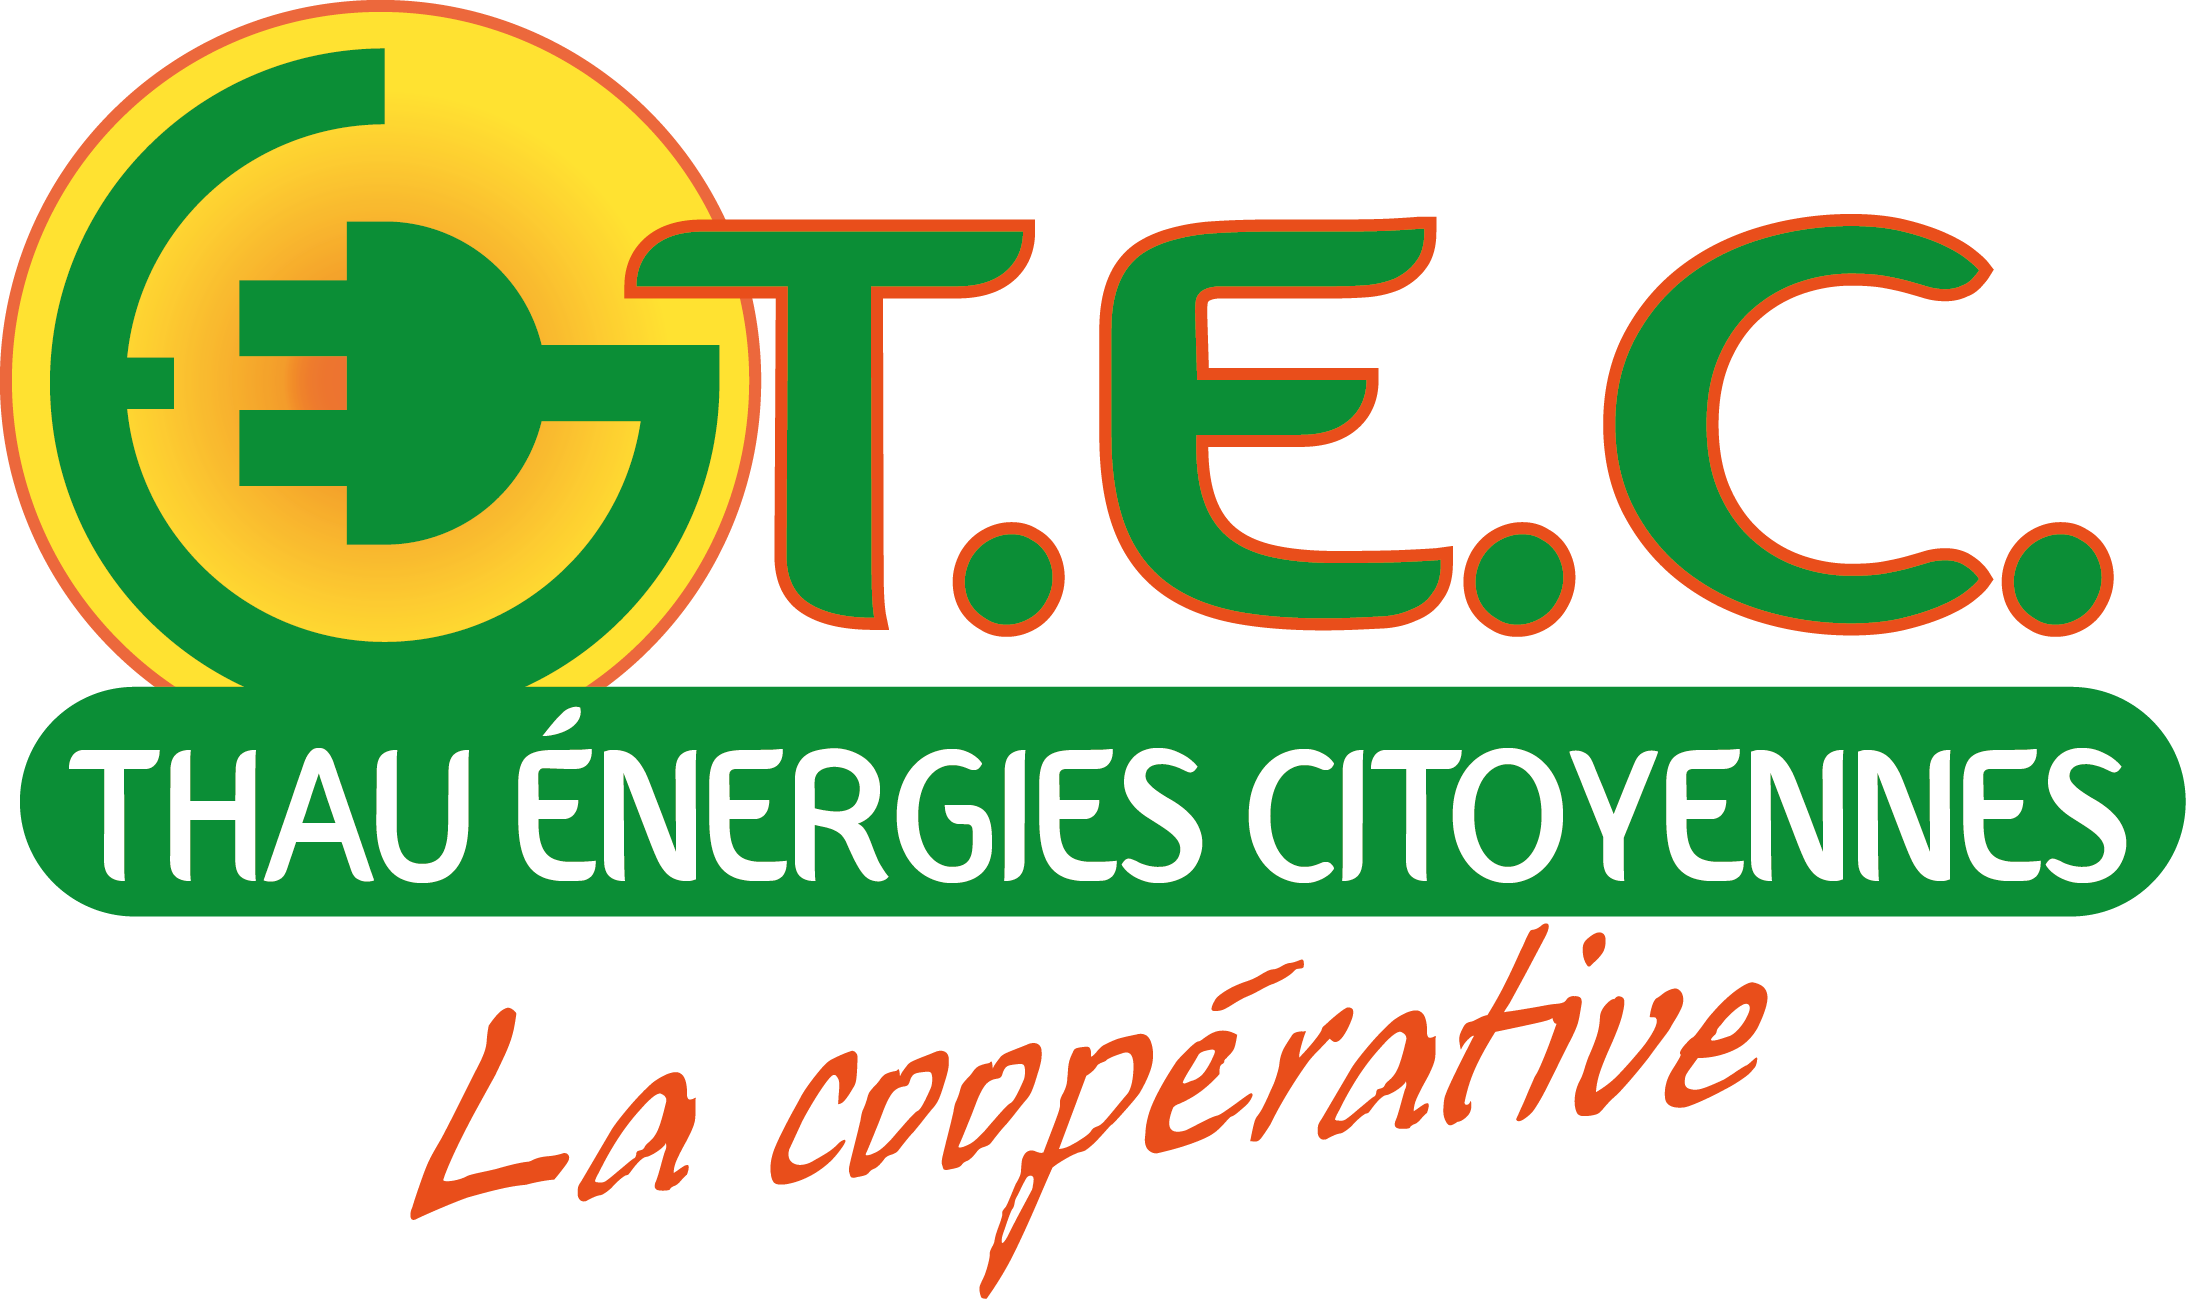 Thau Énergies Citoyennes